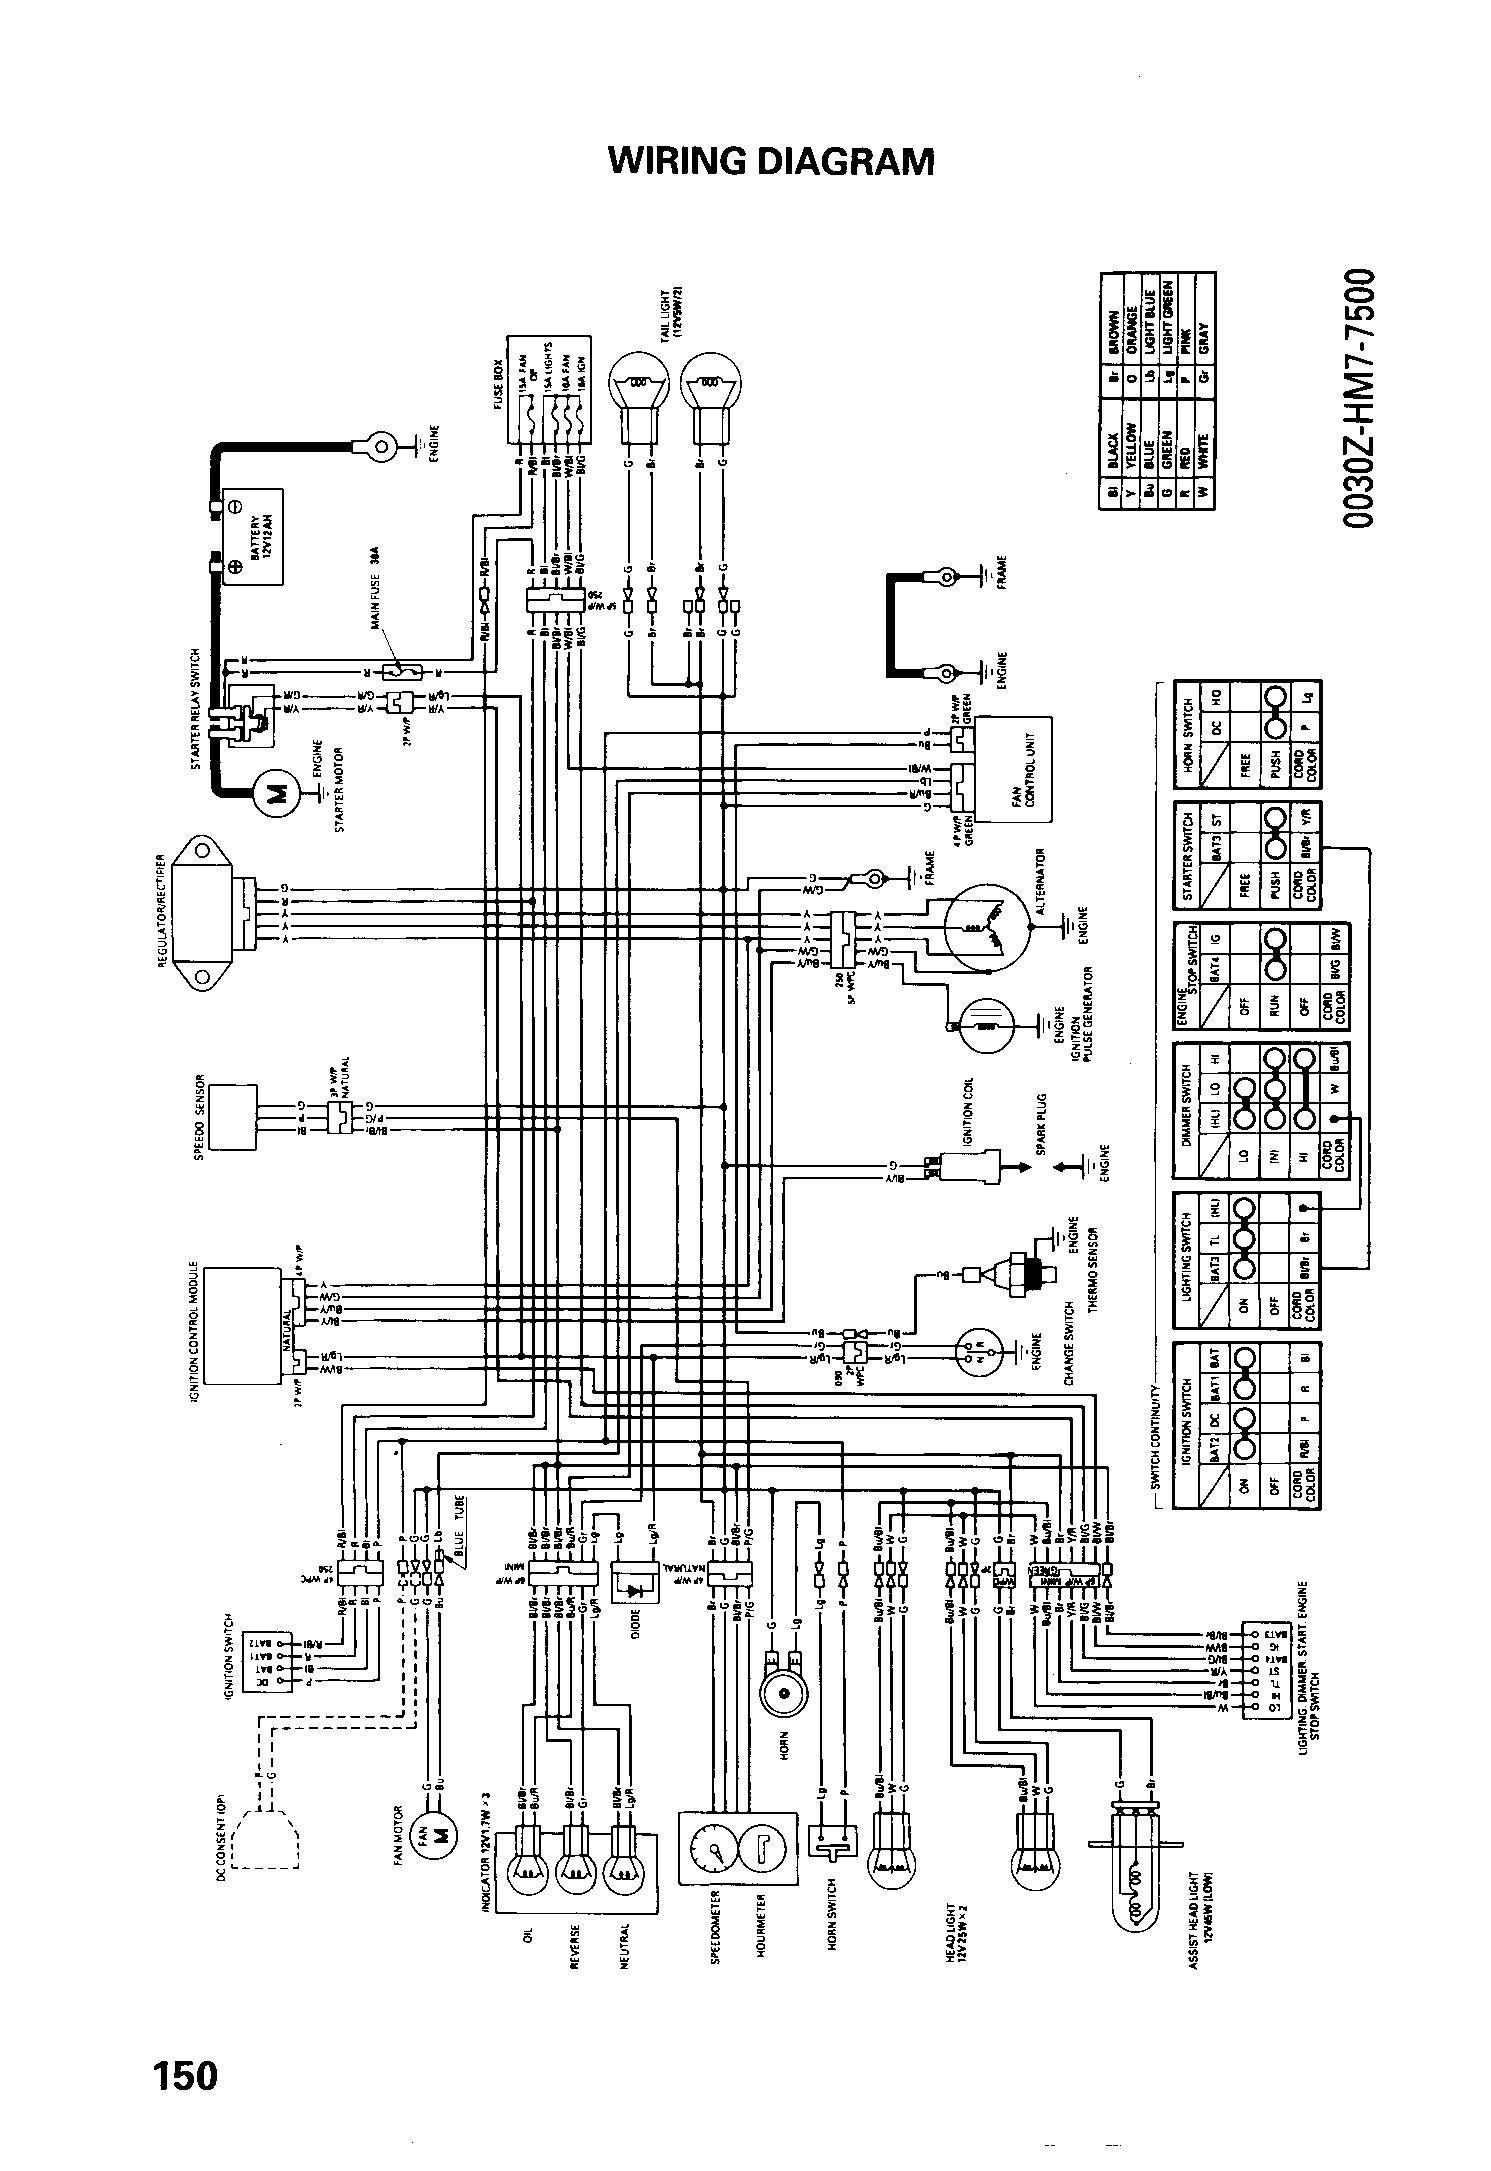 2005 honda rancher ignition switch wiring - wiring diagram shut-series-b -  shut-series-b.pasticceriagele.it  pasticceriagele.it